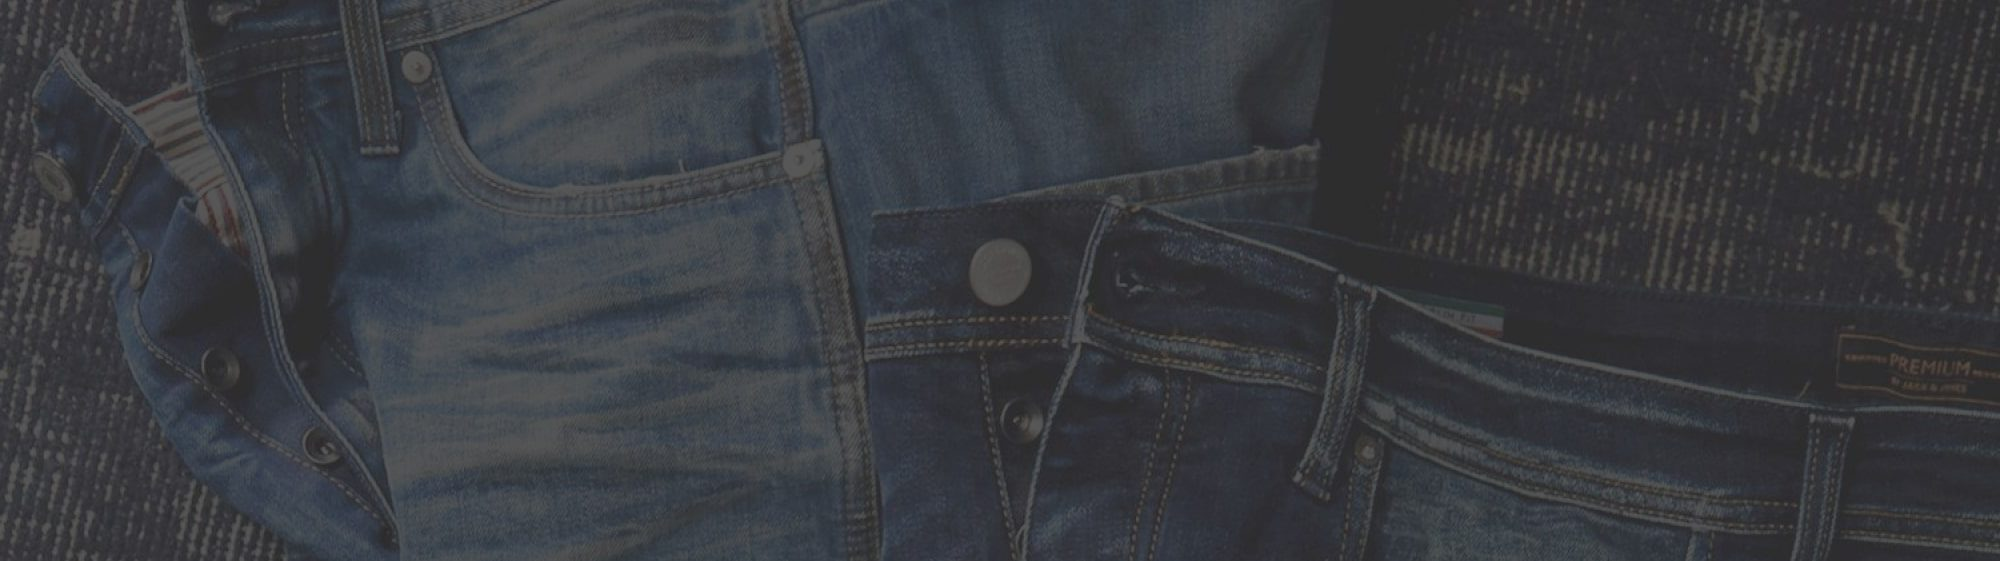 mc_jeans_banner